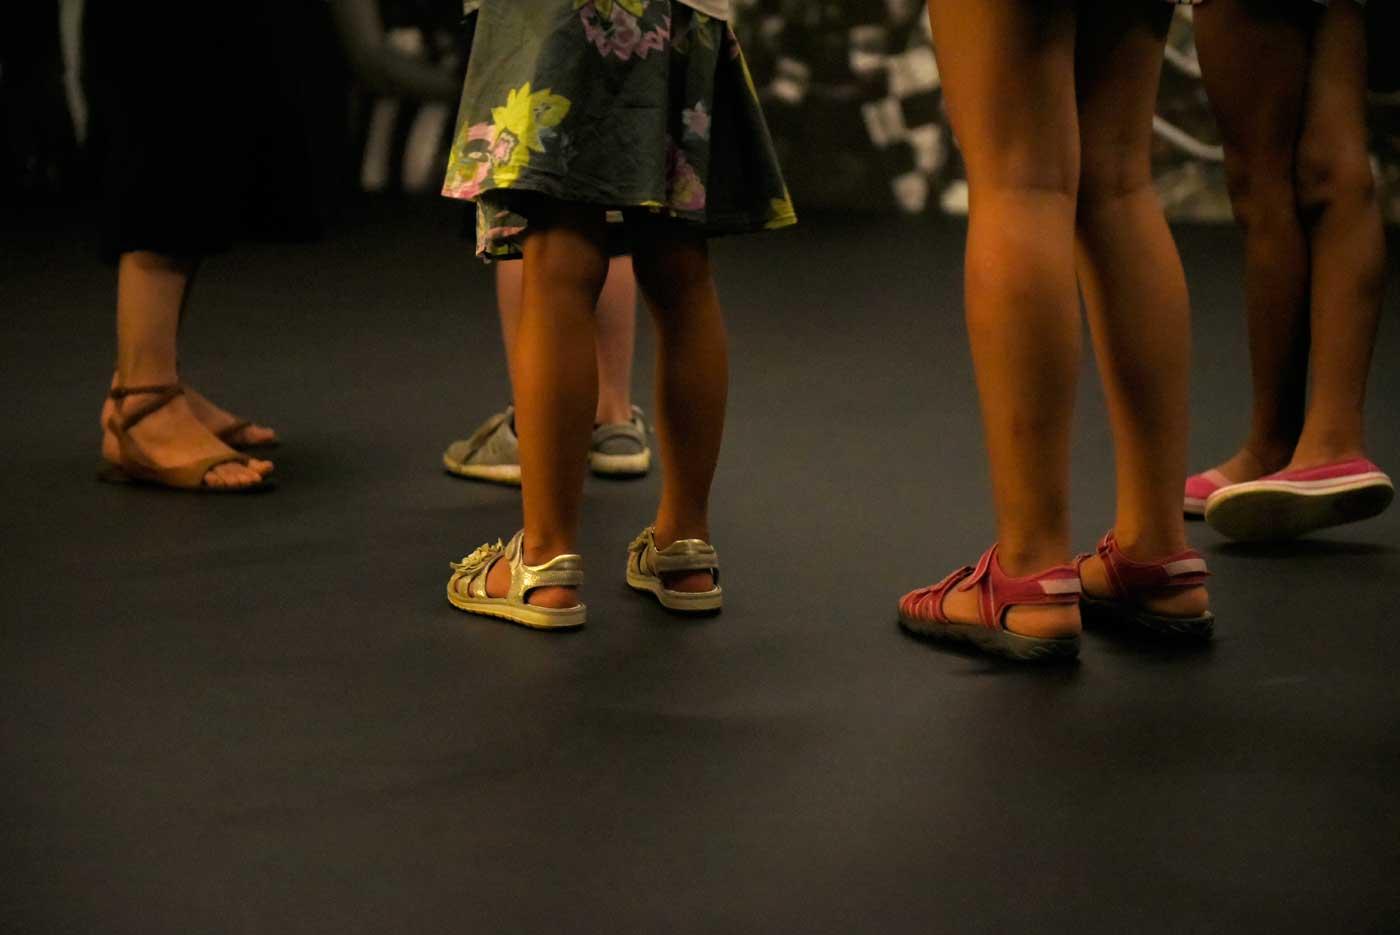 Familienprogramm in der Kunsthalle München // HIMBEER